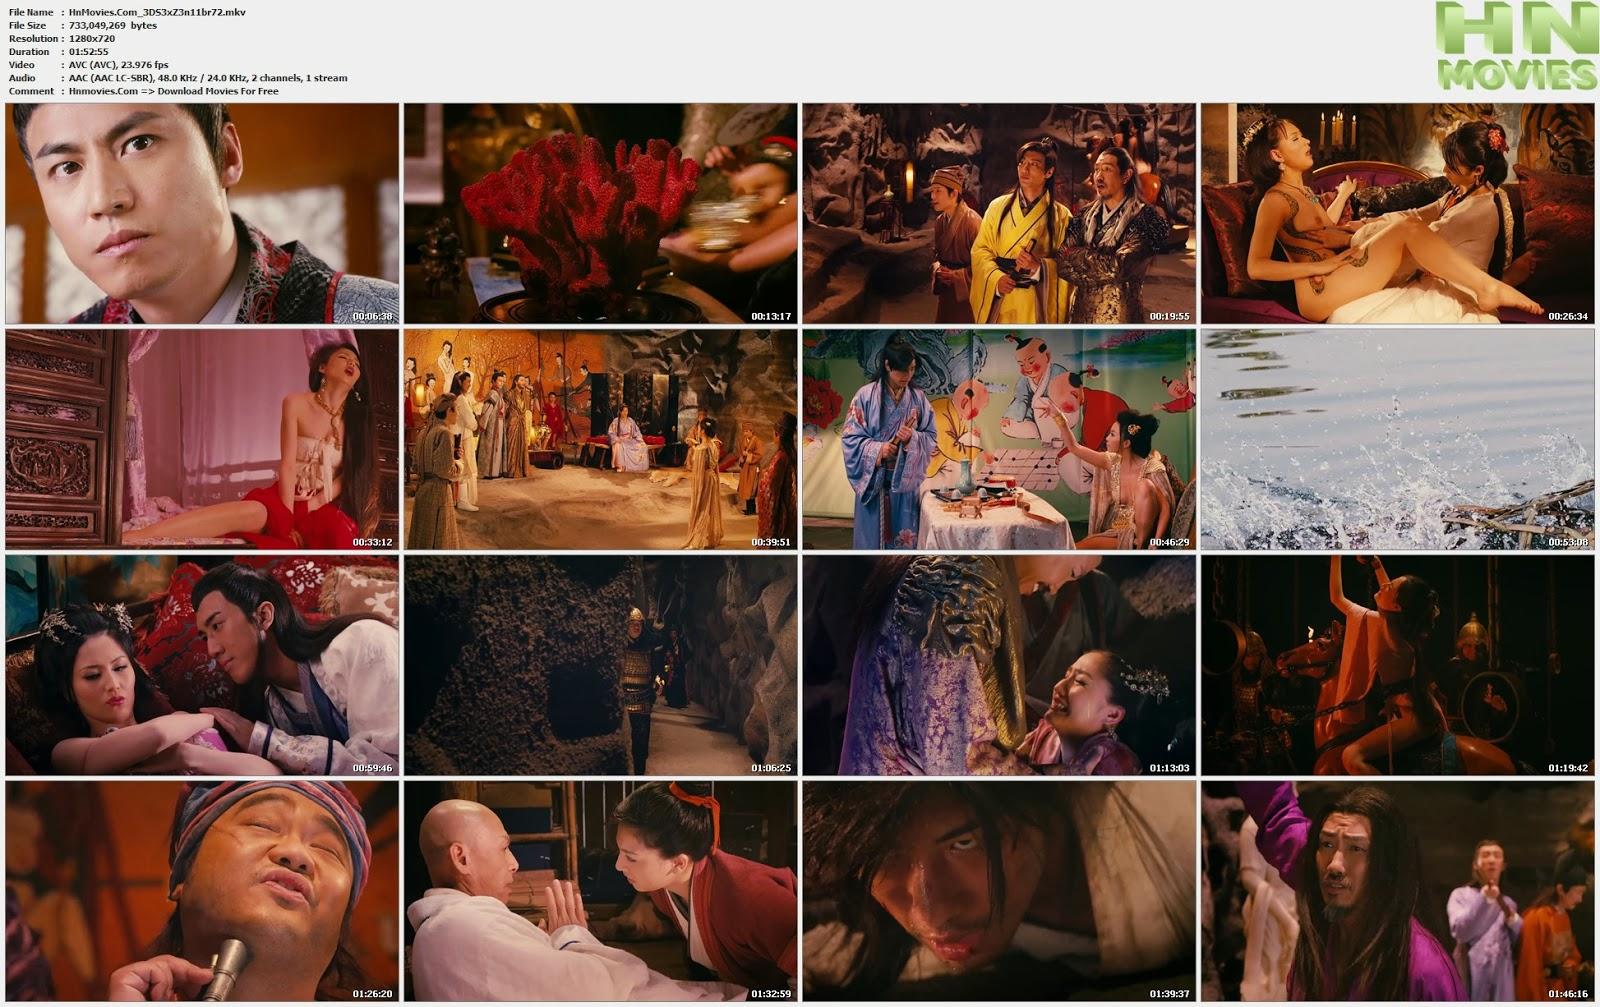 HnMovies.Com 3DS3xZ3n11br72.mkv